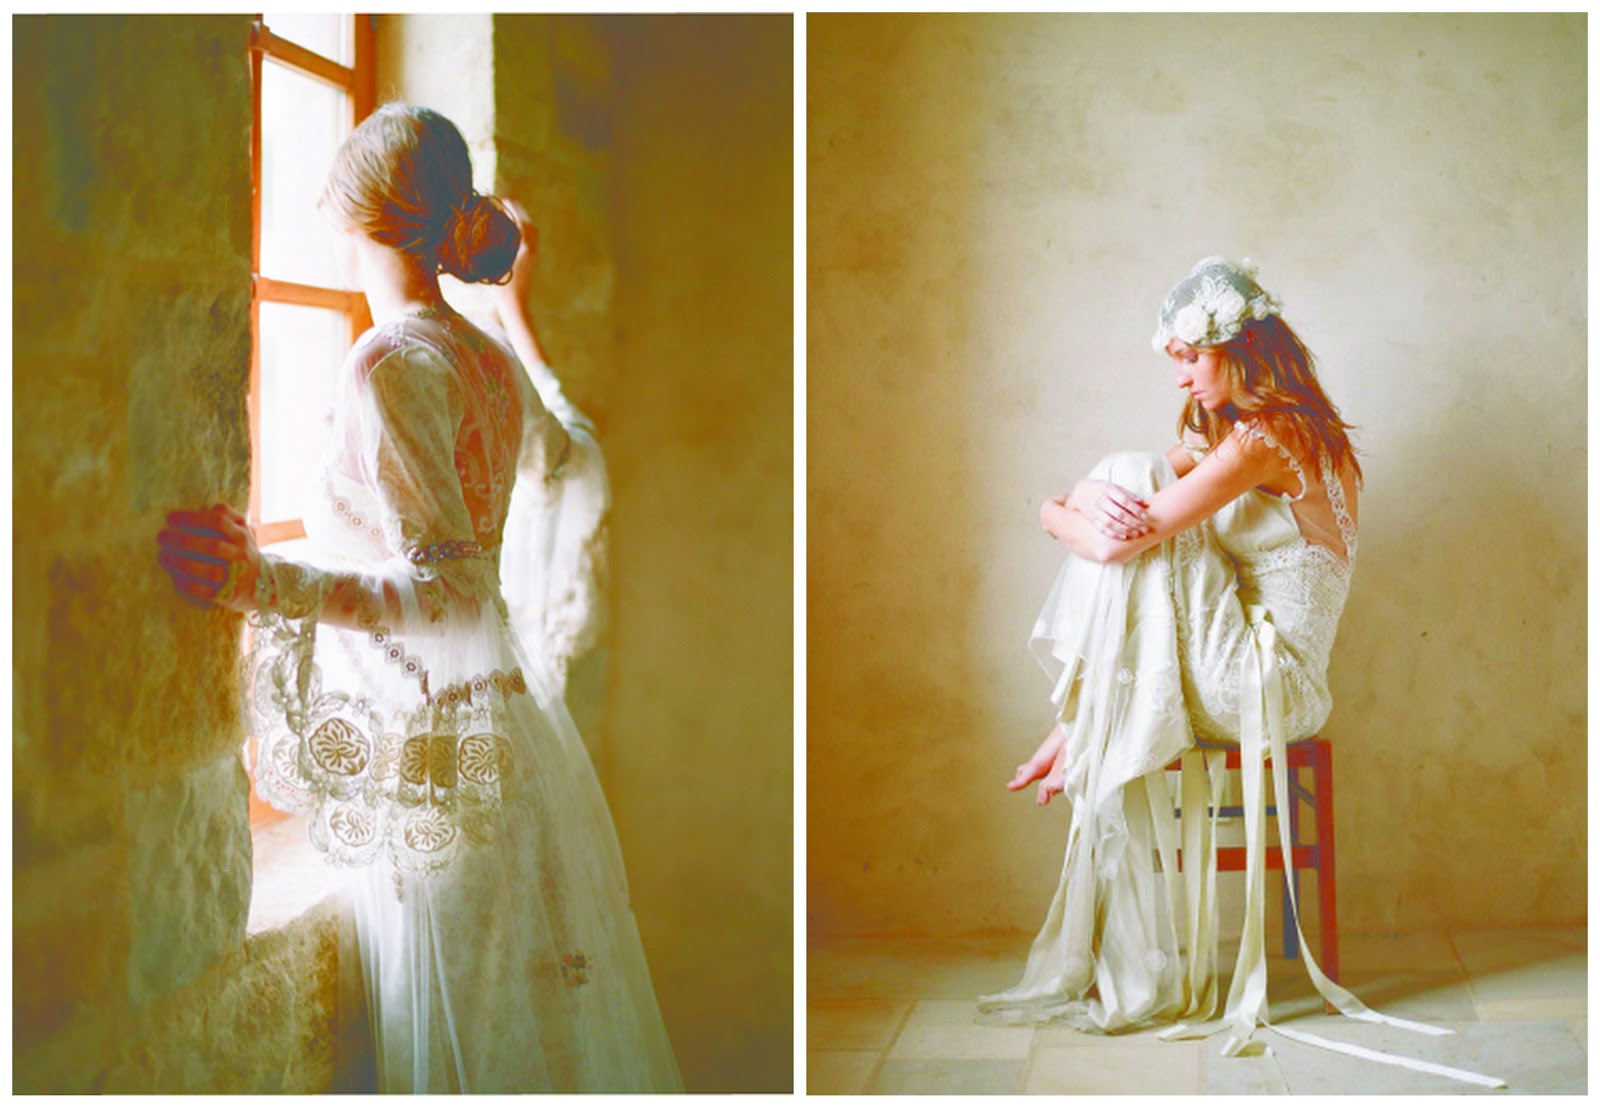 Vintage Romantic Wedding Dresses By Claire Pettibone